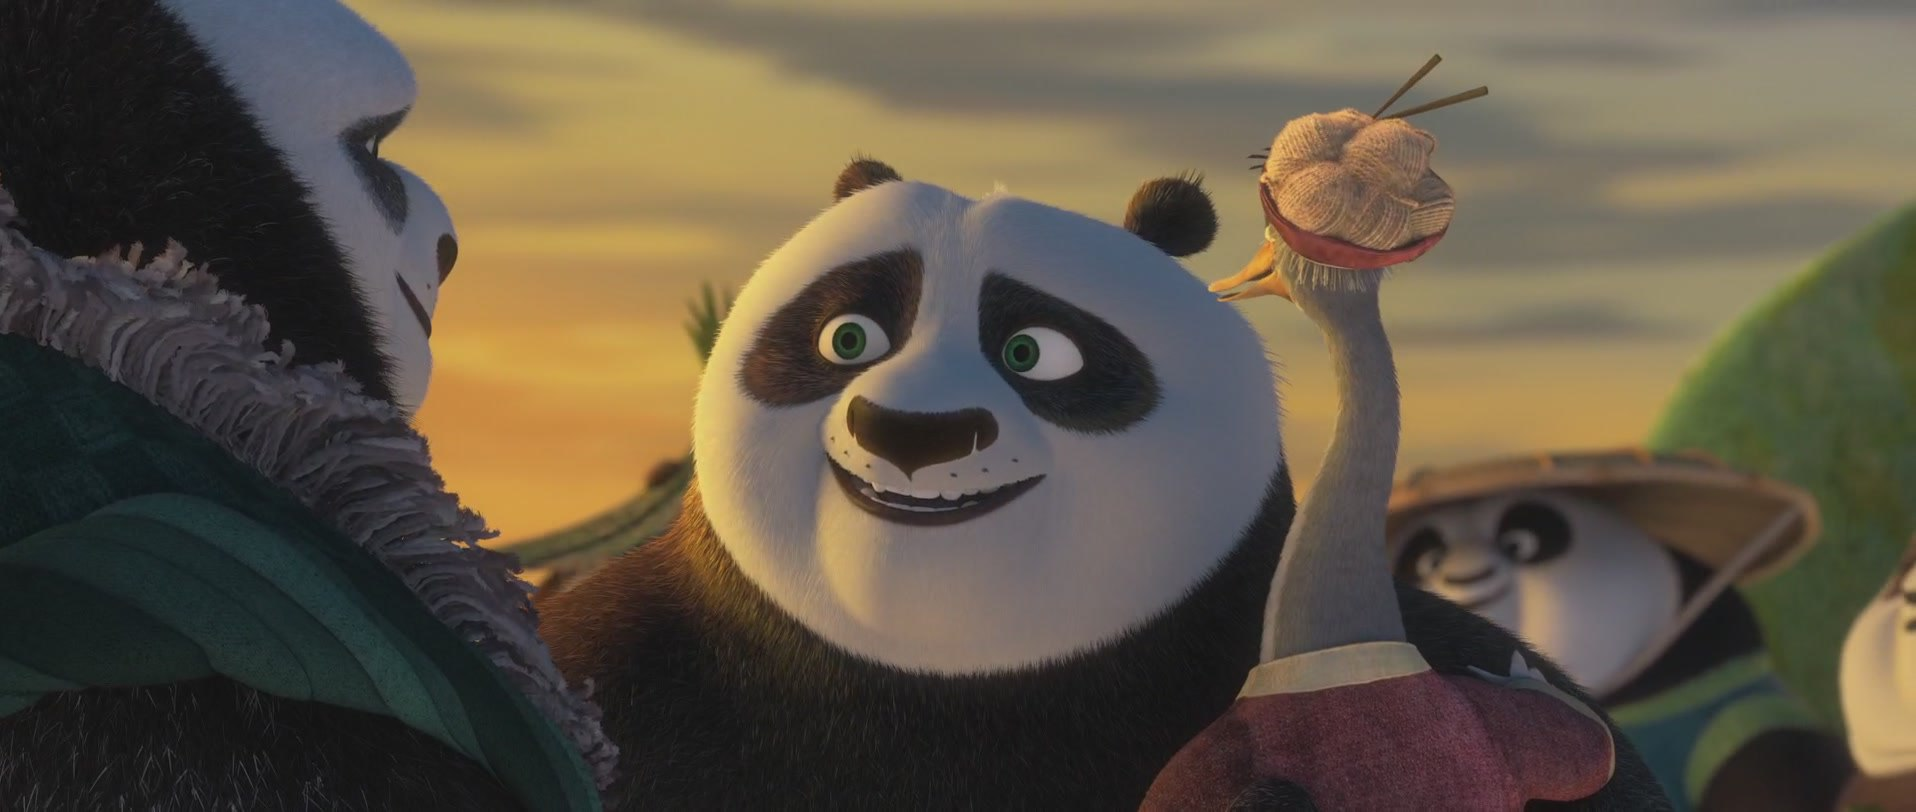 скриншот панда 3